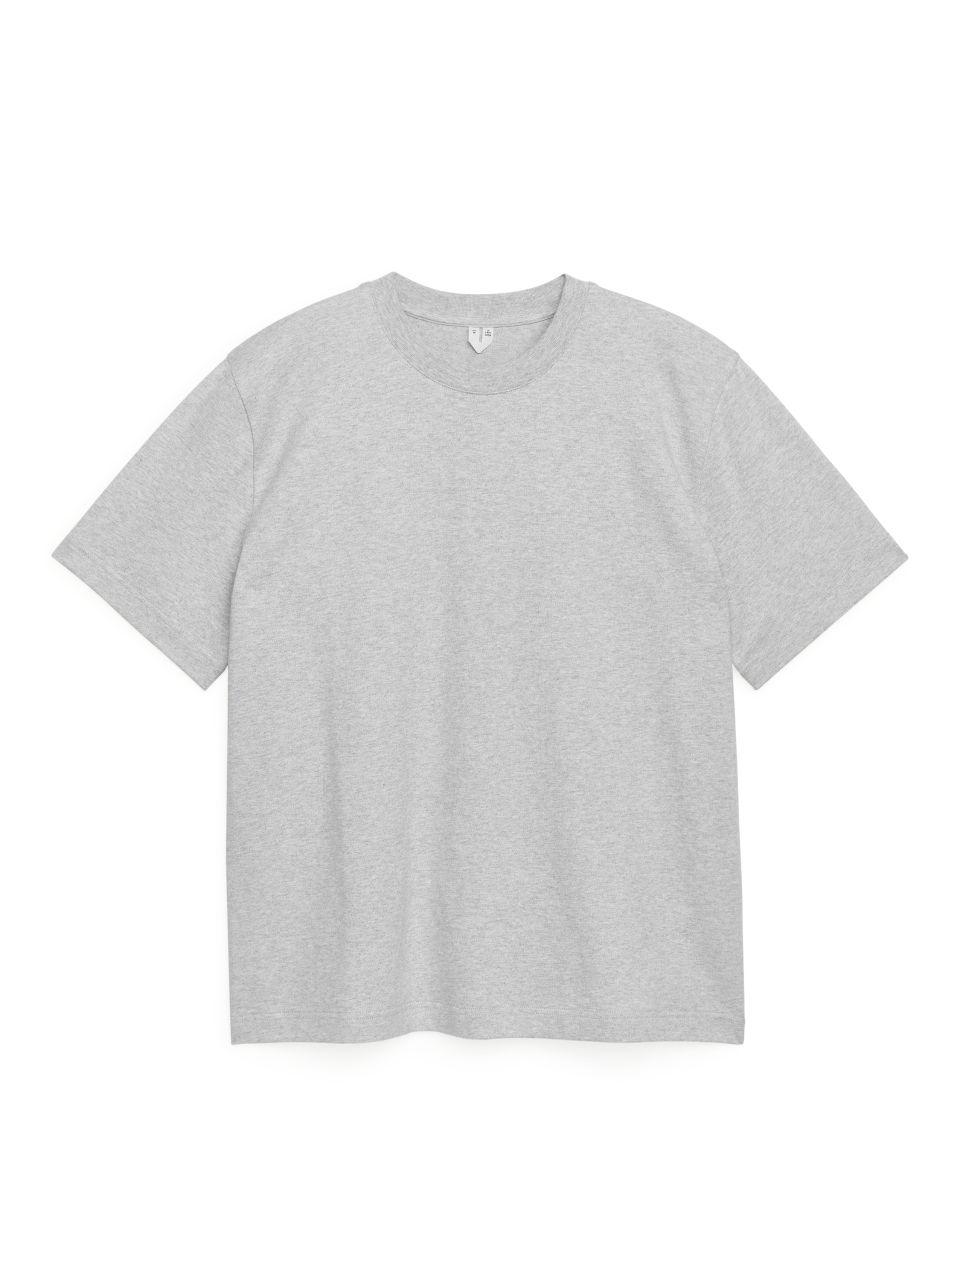 Oversized Heavyweight T-shirt - Grey